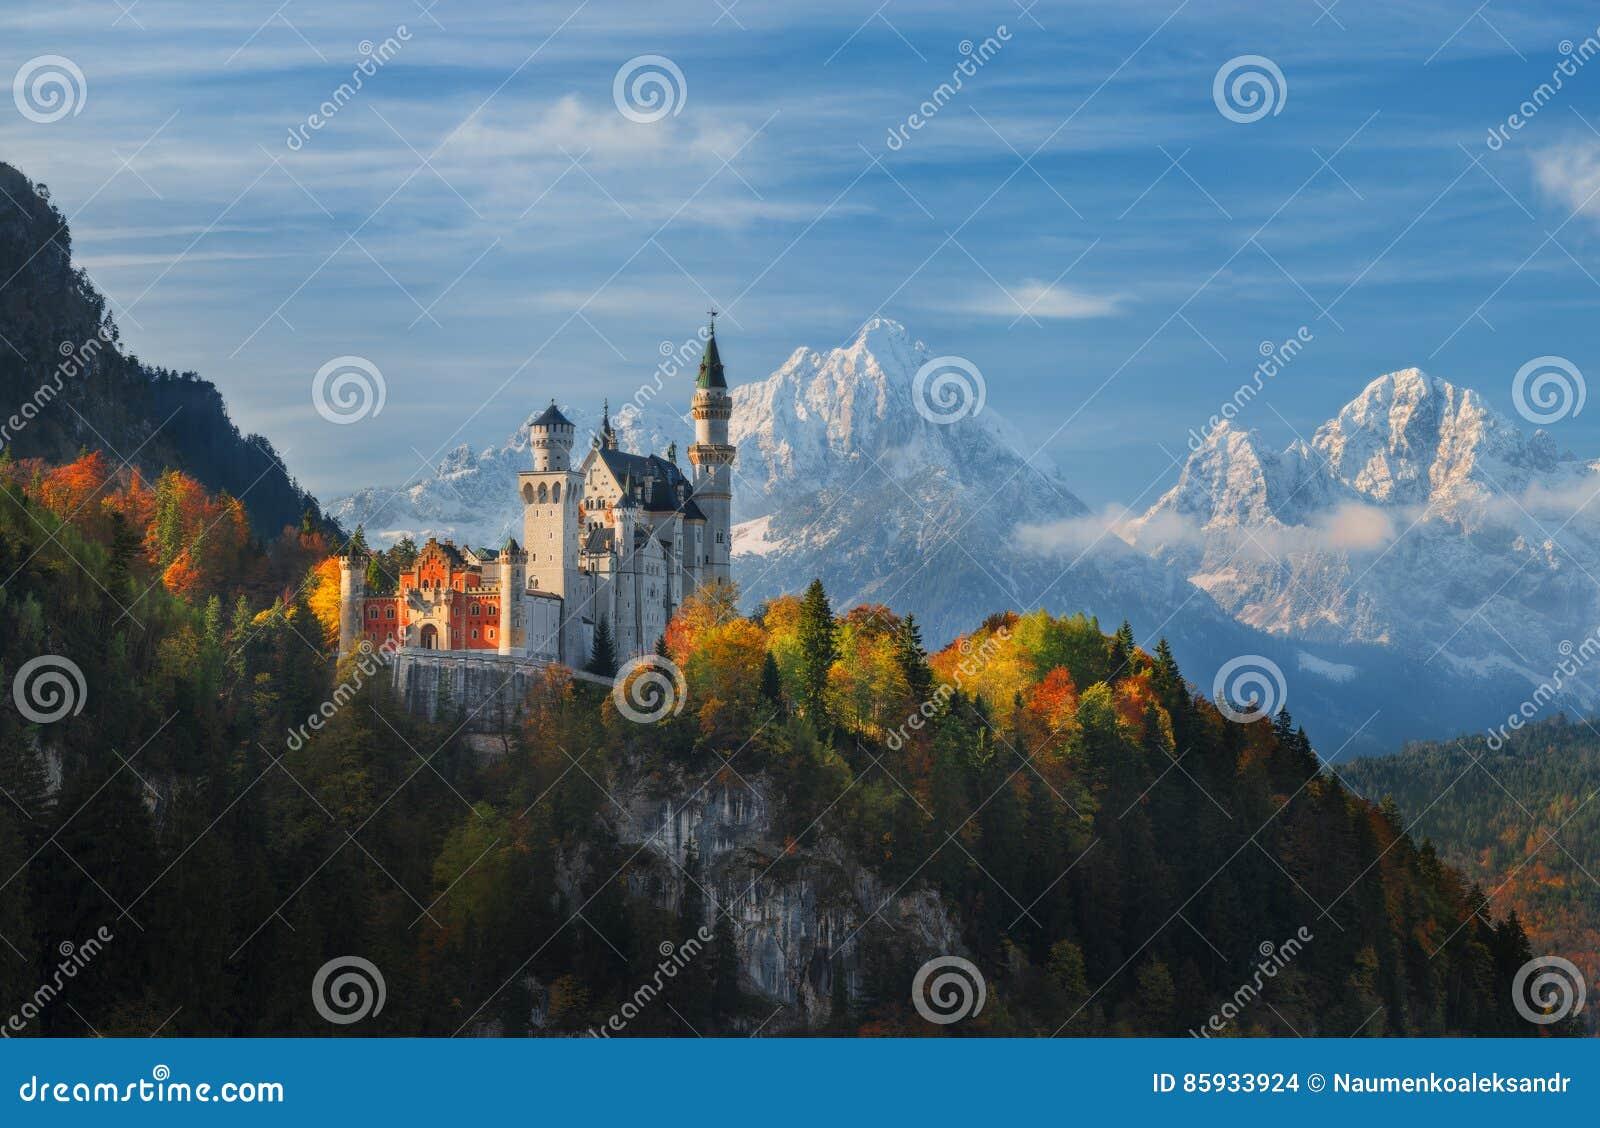 Castillo de Neuschwanstein del panorama